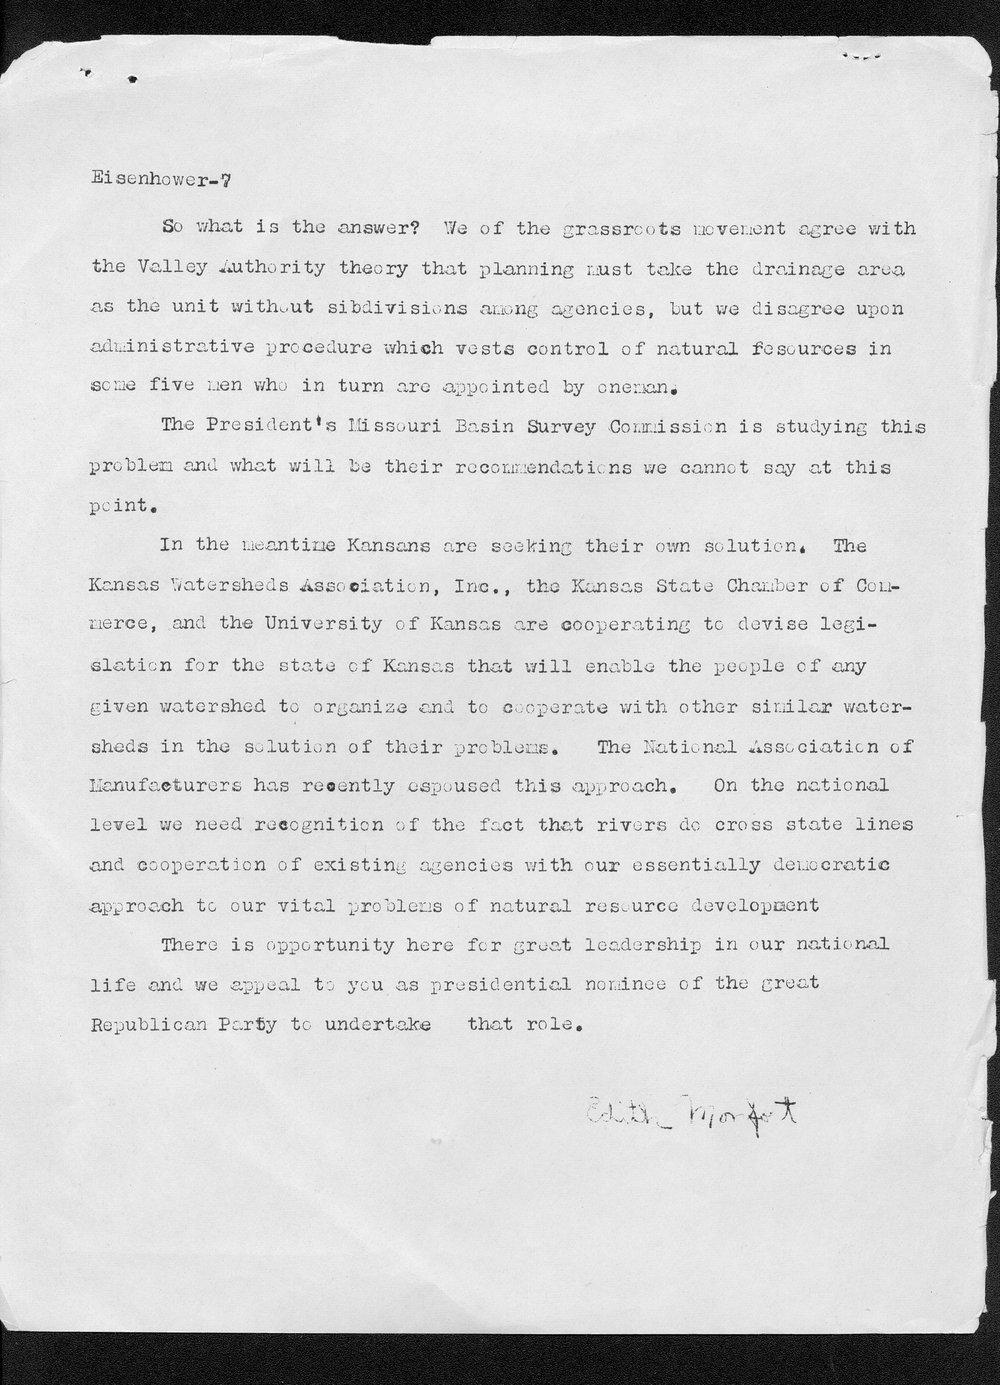 Edith Monfort to Dwight Eisenhower - 7